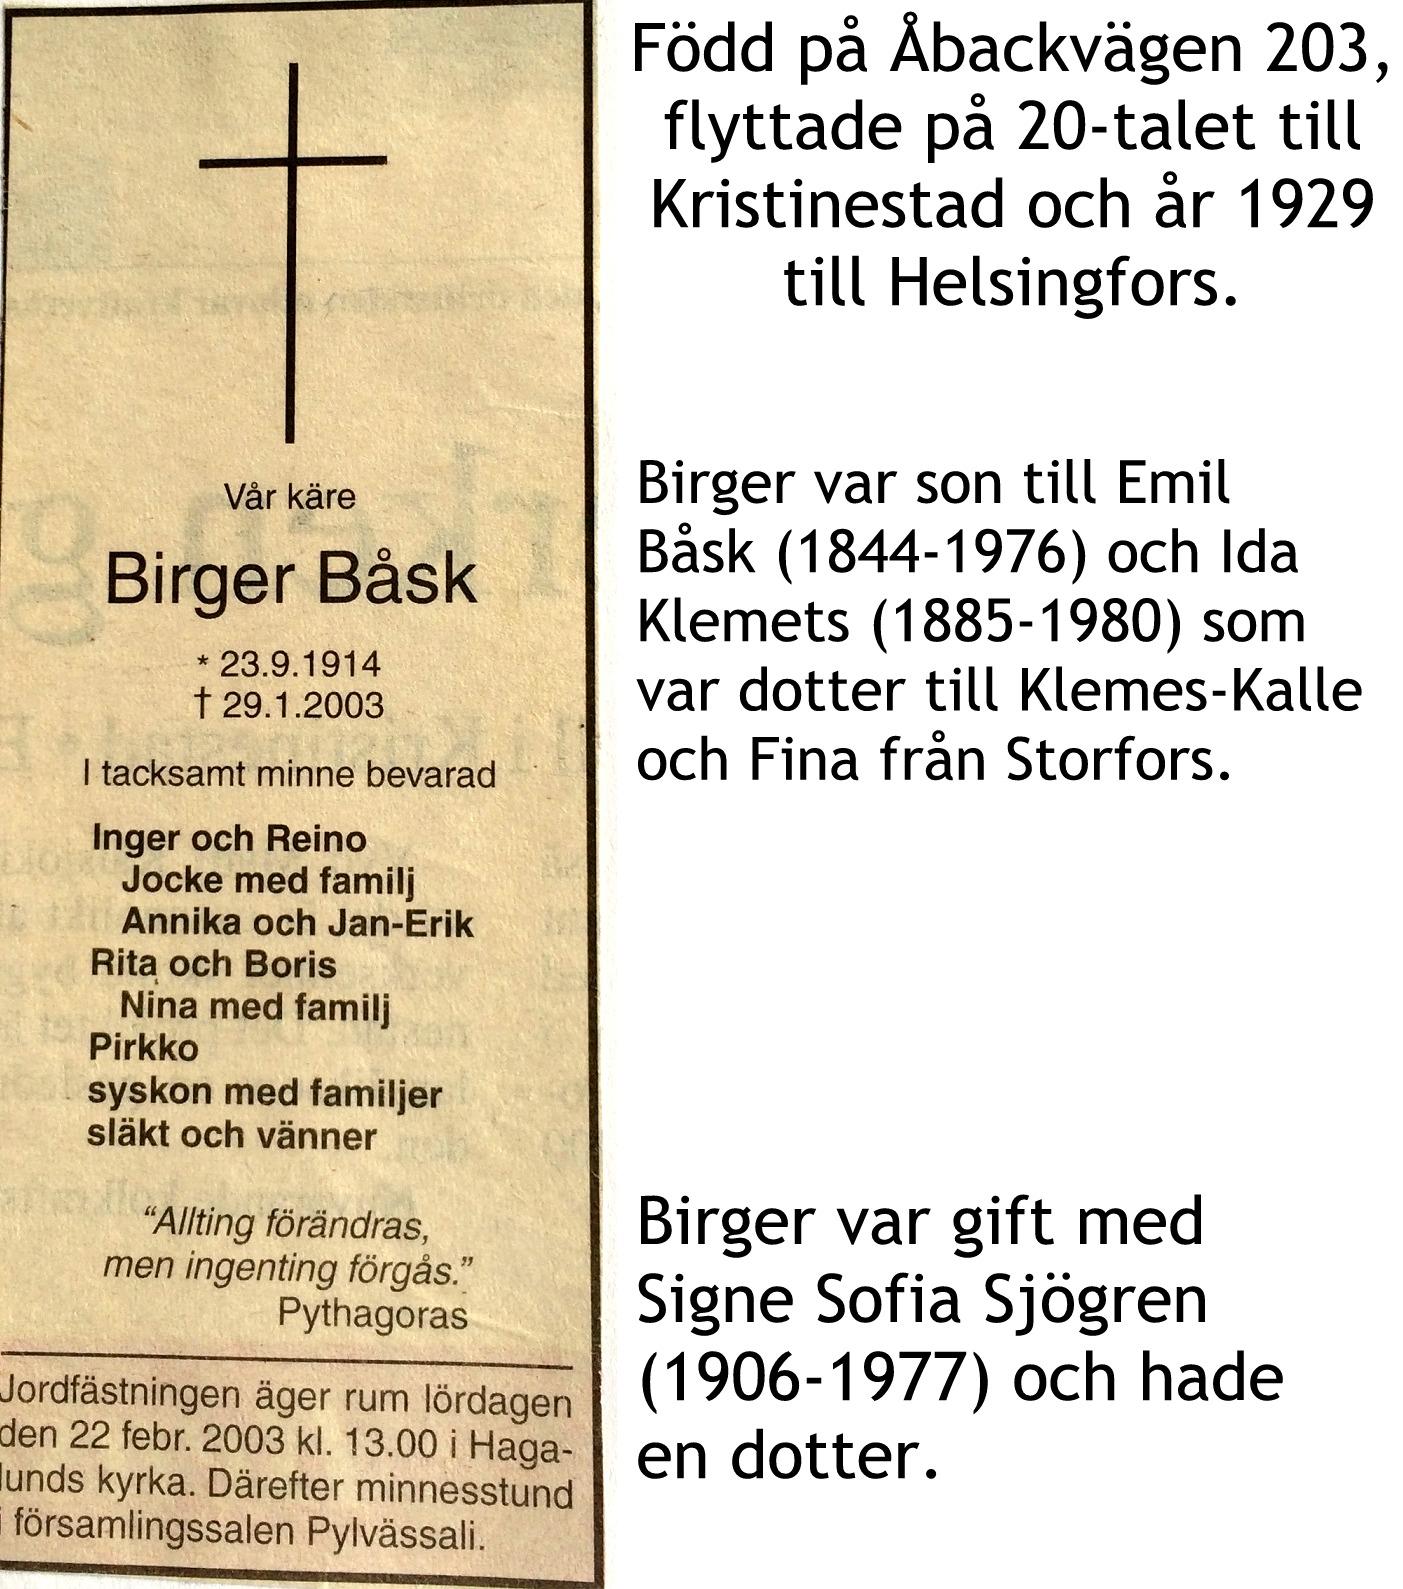 Båsk Birger